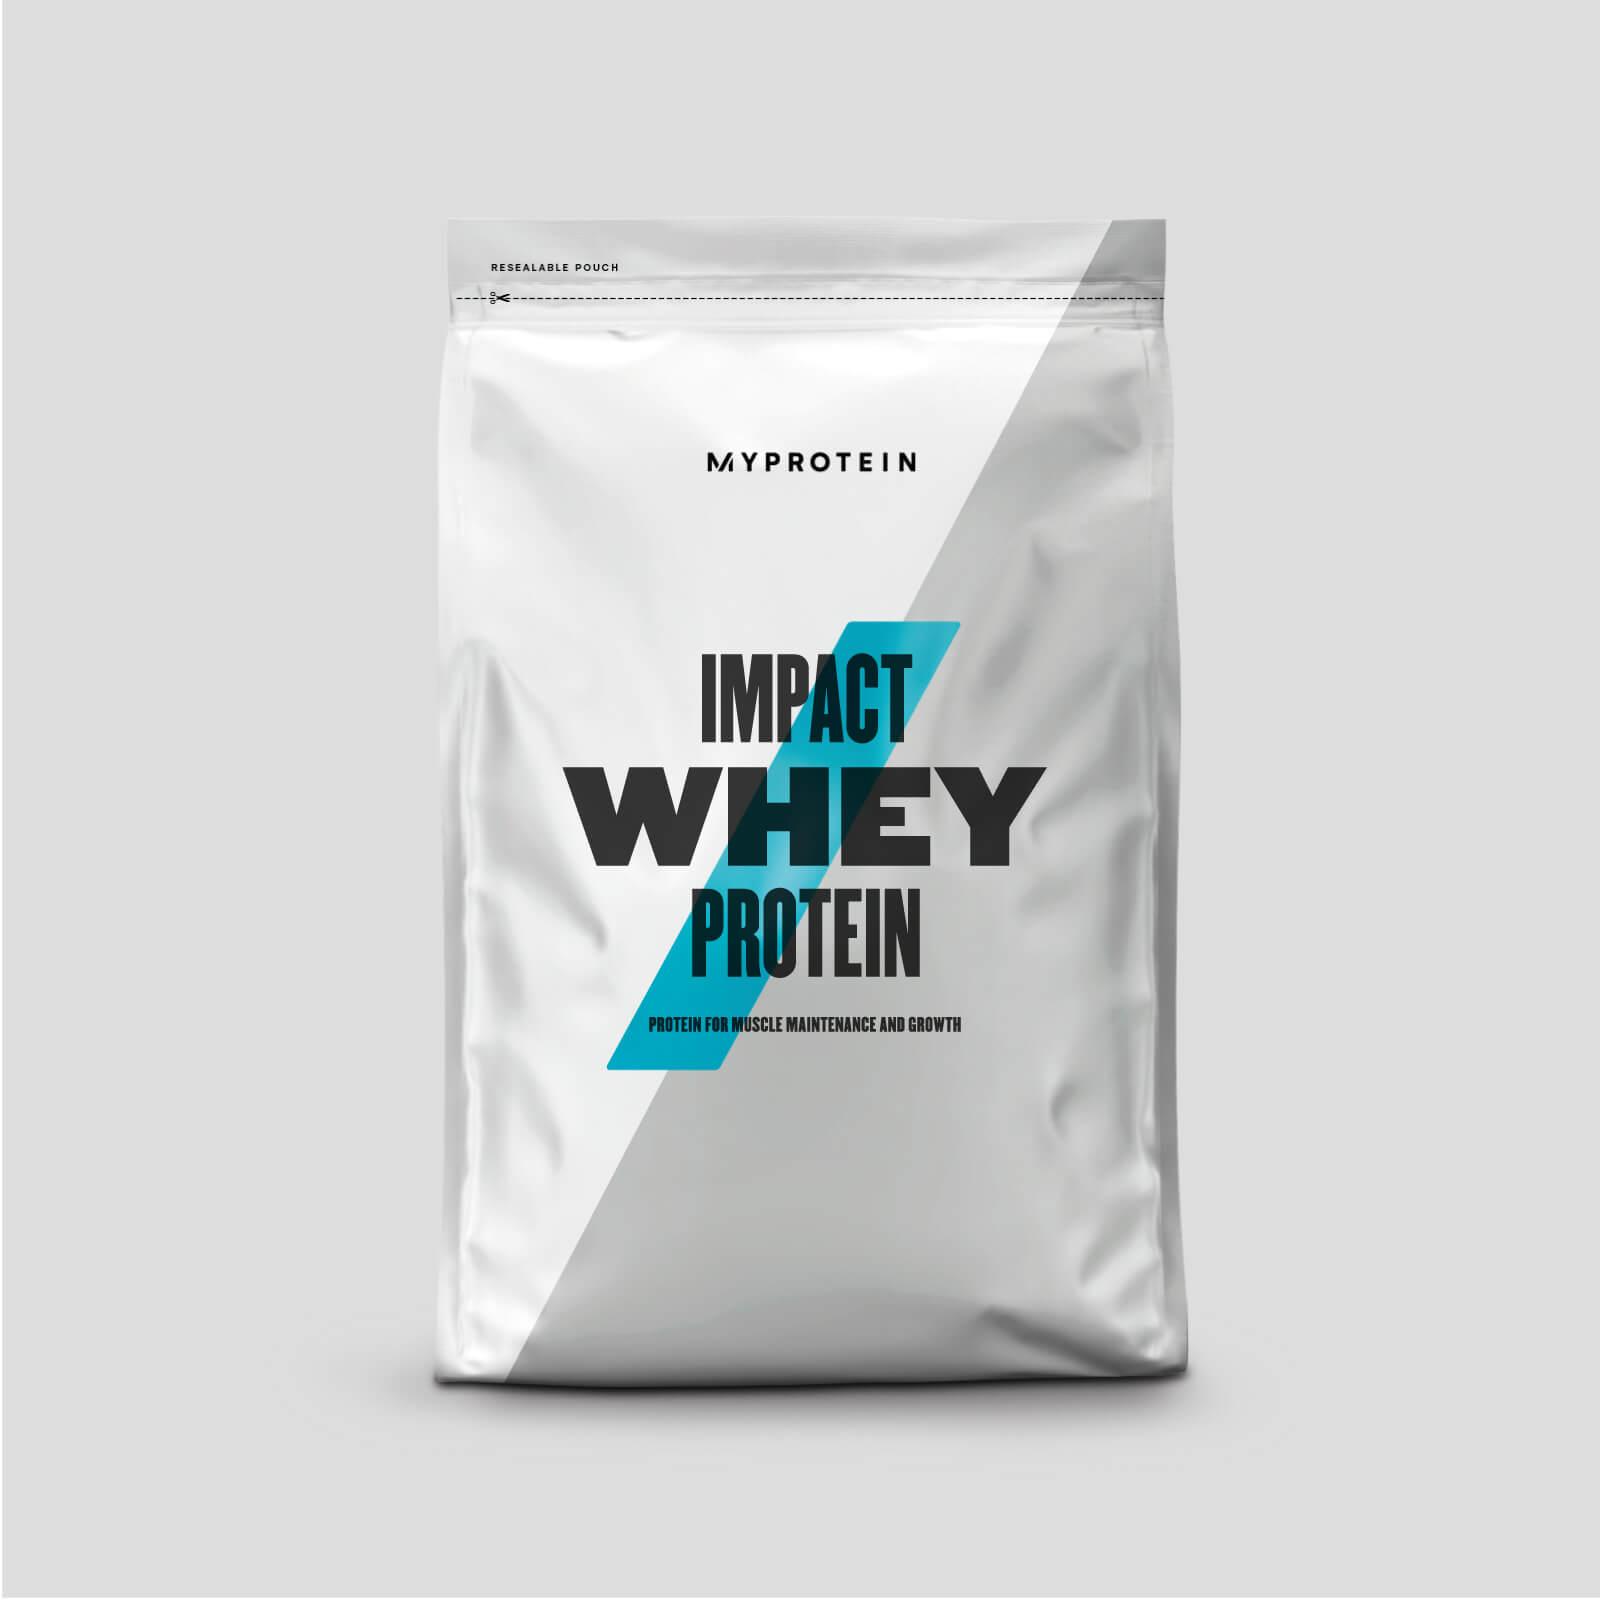 Myprotein Impact Whey Protein - 5kg - Vanilla Stevia